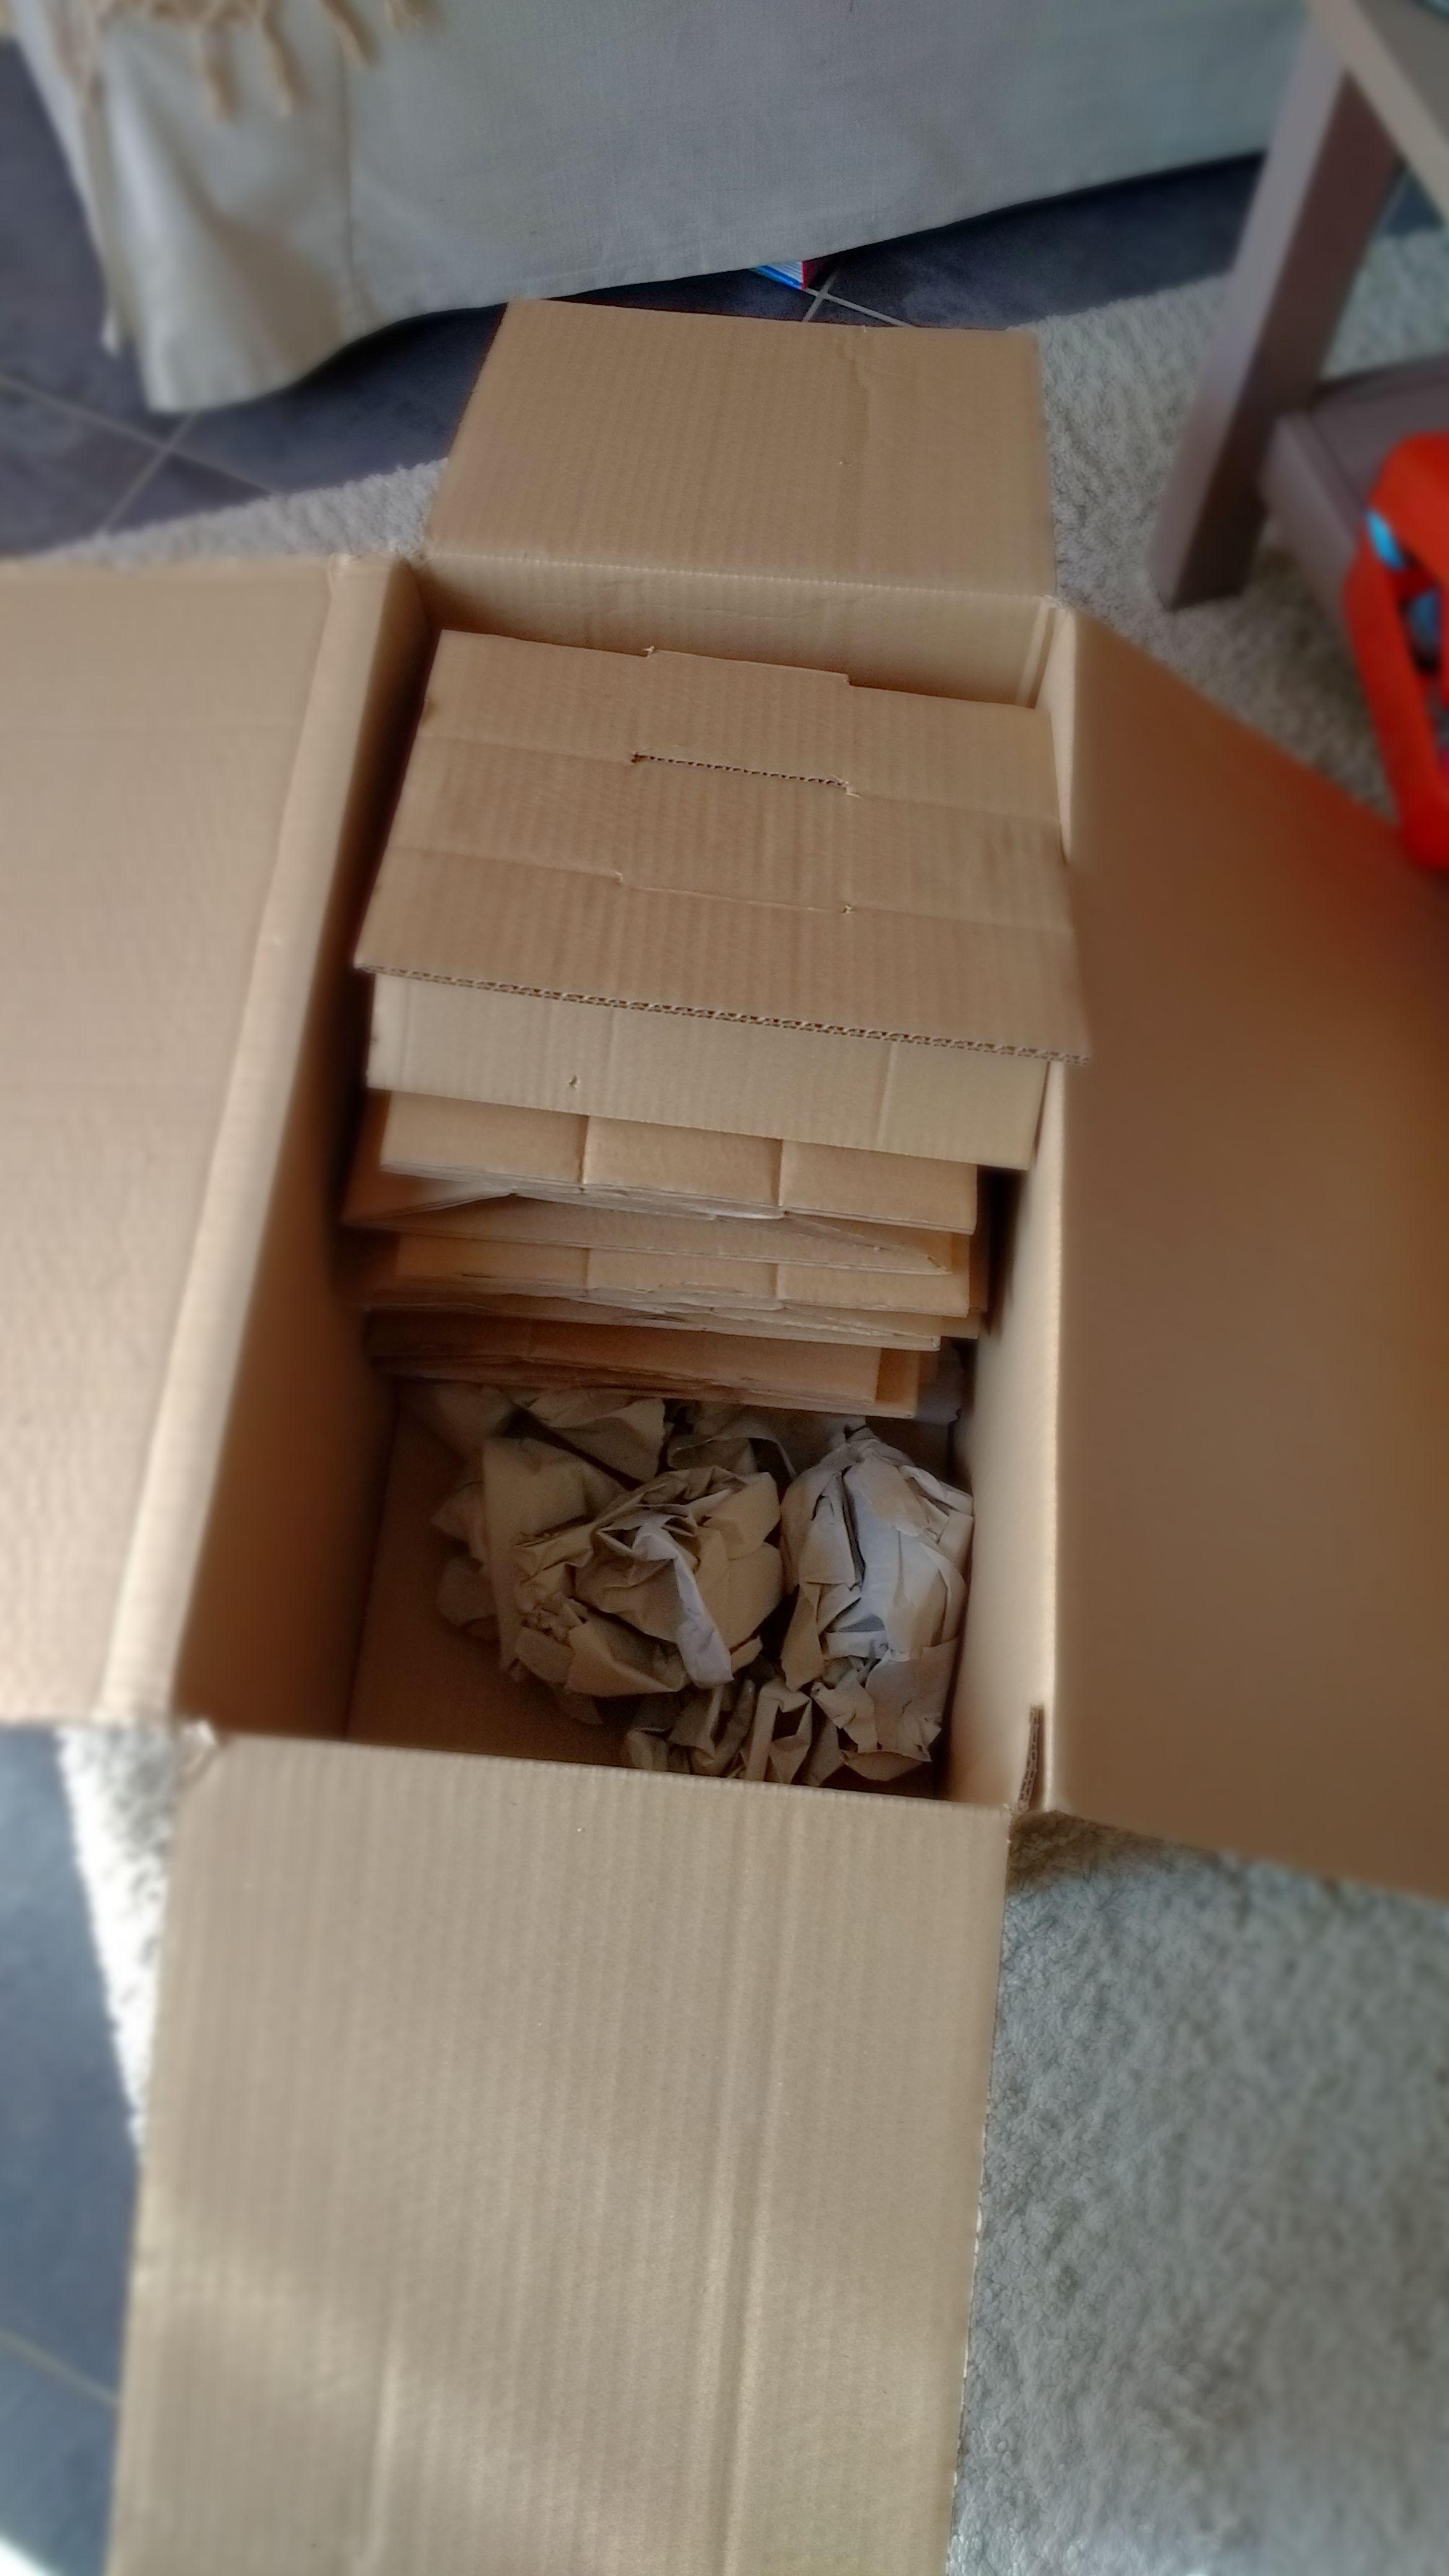 Carton rangé